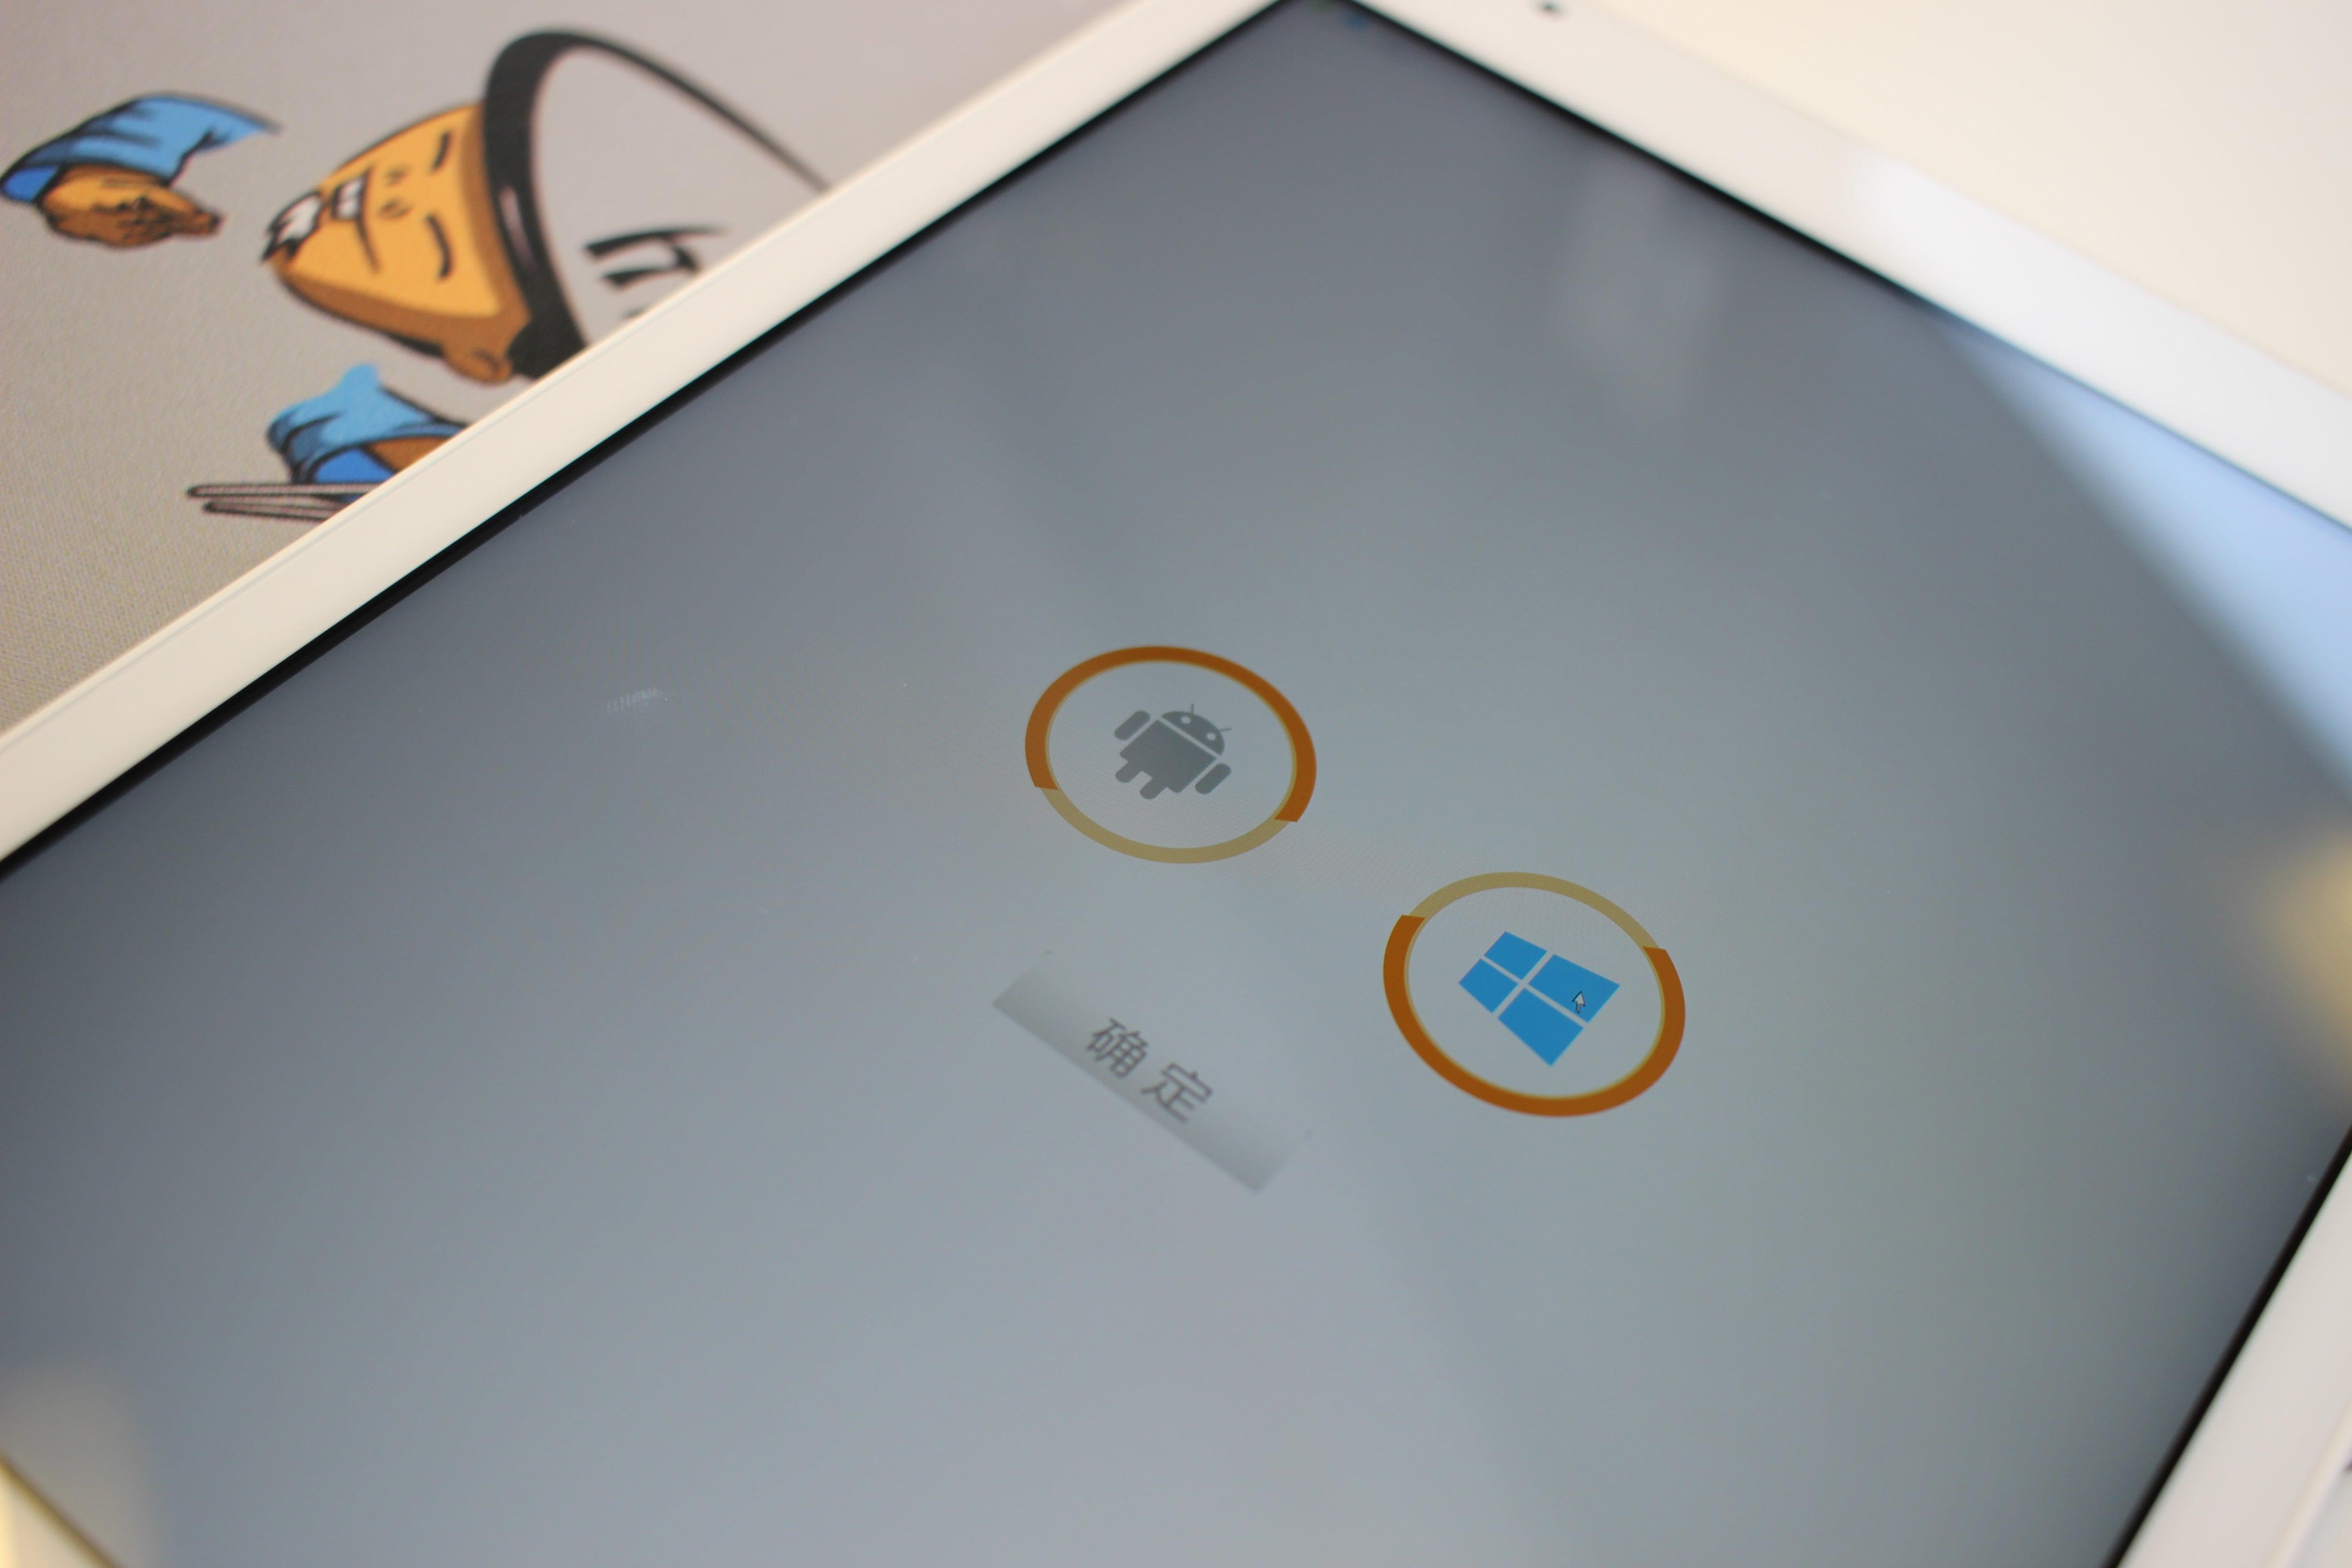 Harga Dan Spesifikasi Selimut Vito Kids Sutra Panel 100x140 Mickey Keroppi Teclast X80hd Dual Os Windows 10 Ampamp Android 32gb 8 Inch Hd